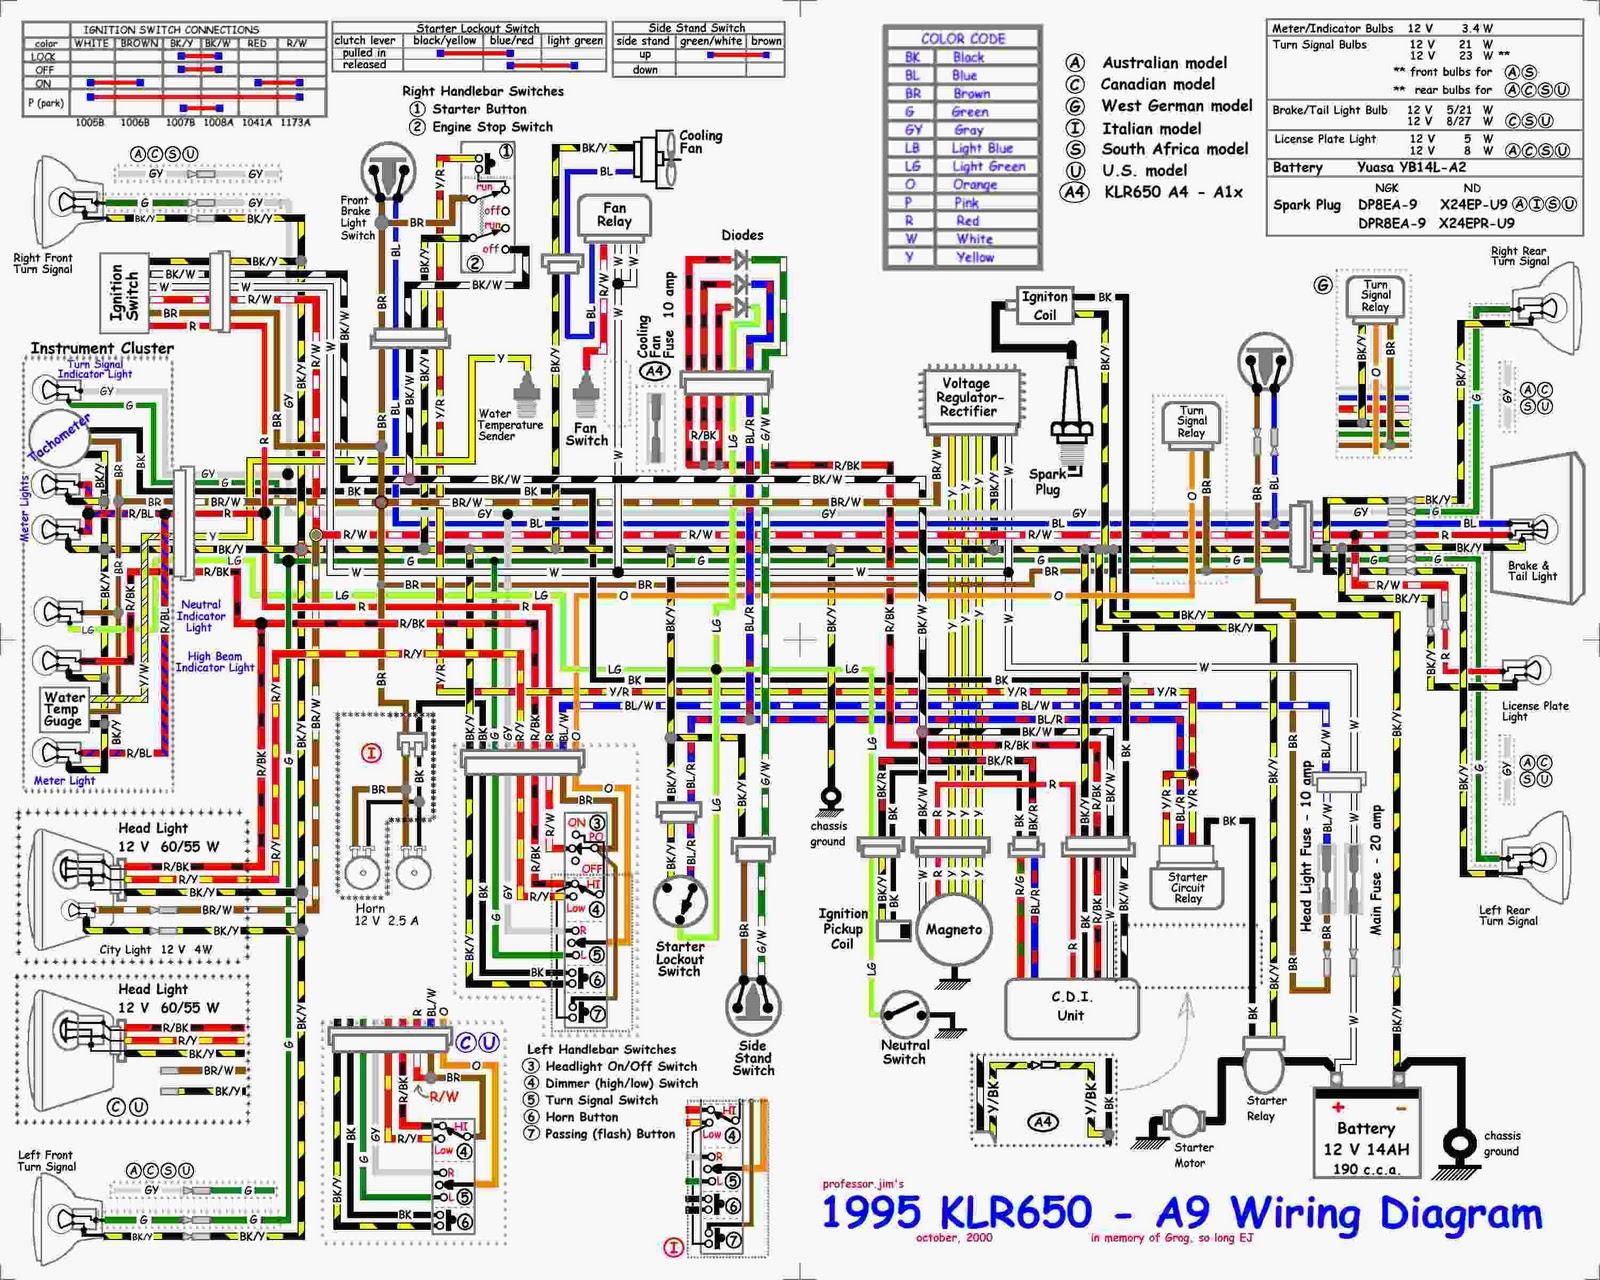 1995 Kawasaki KLR650 Wiring Diagram | All about Wiring